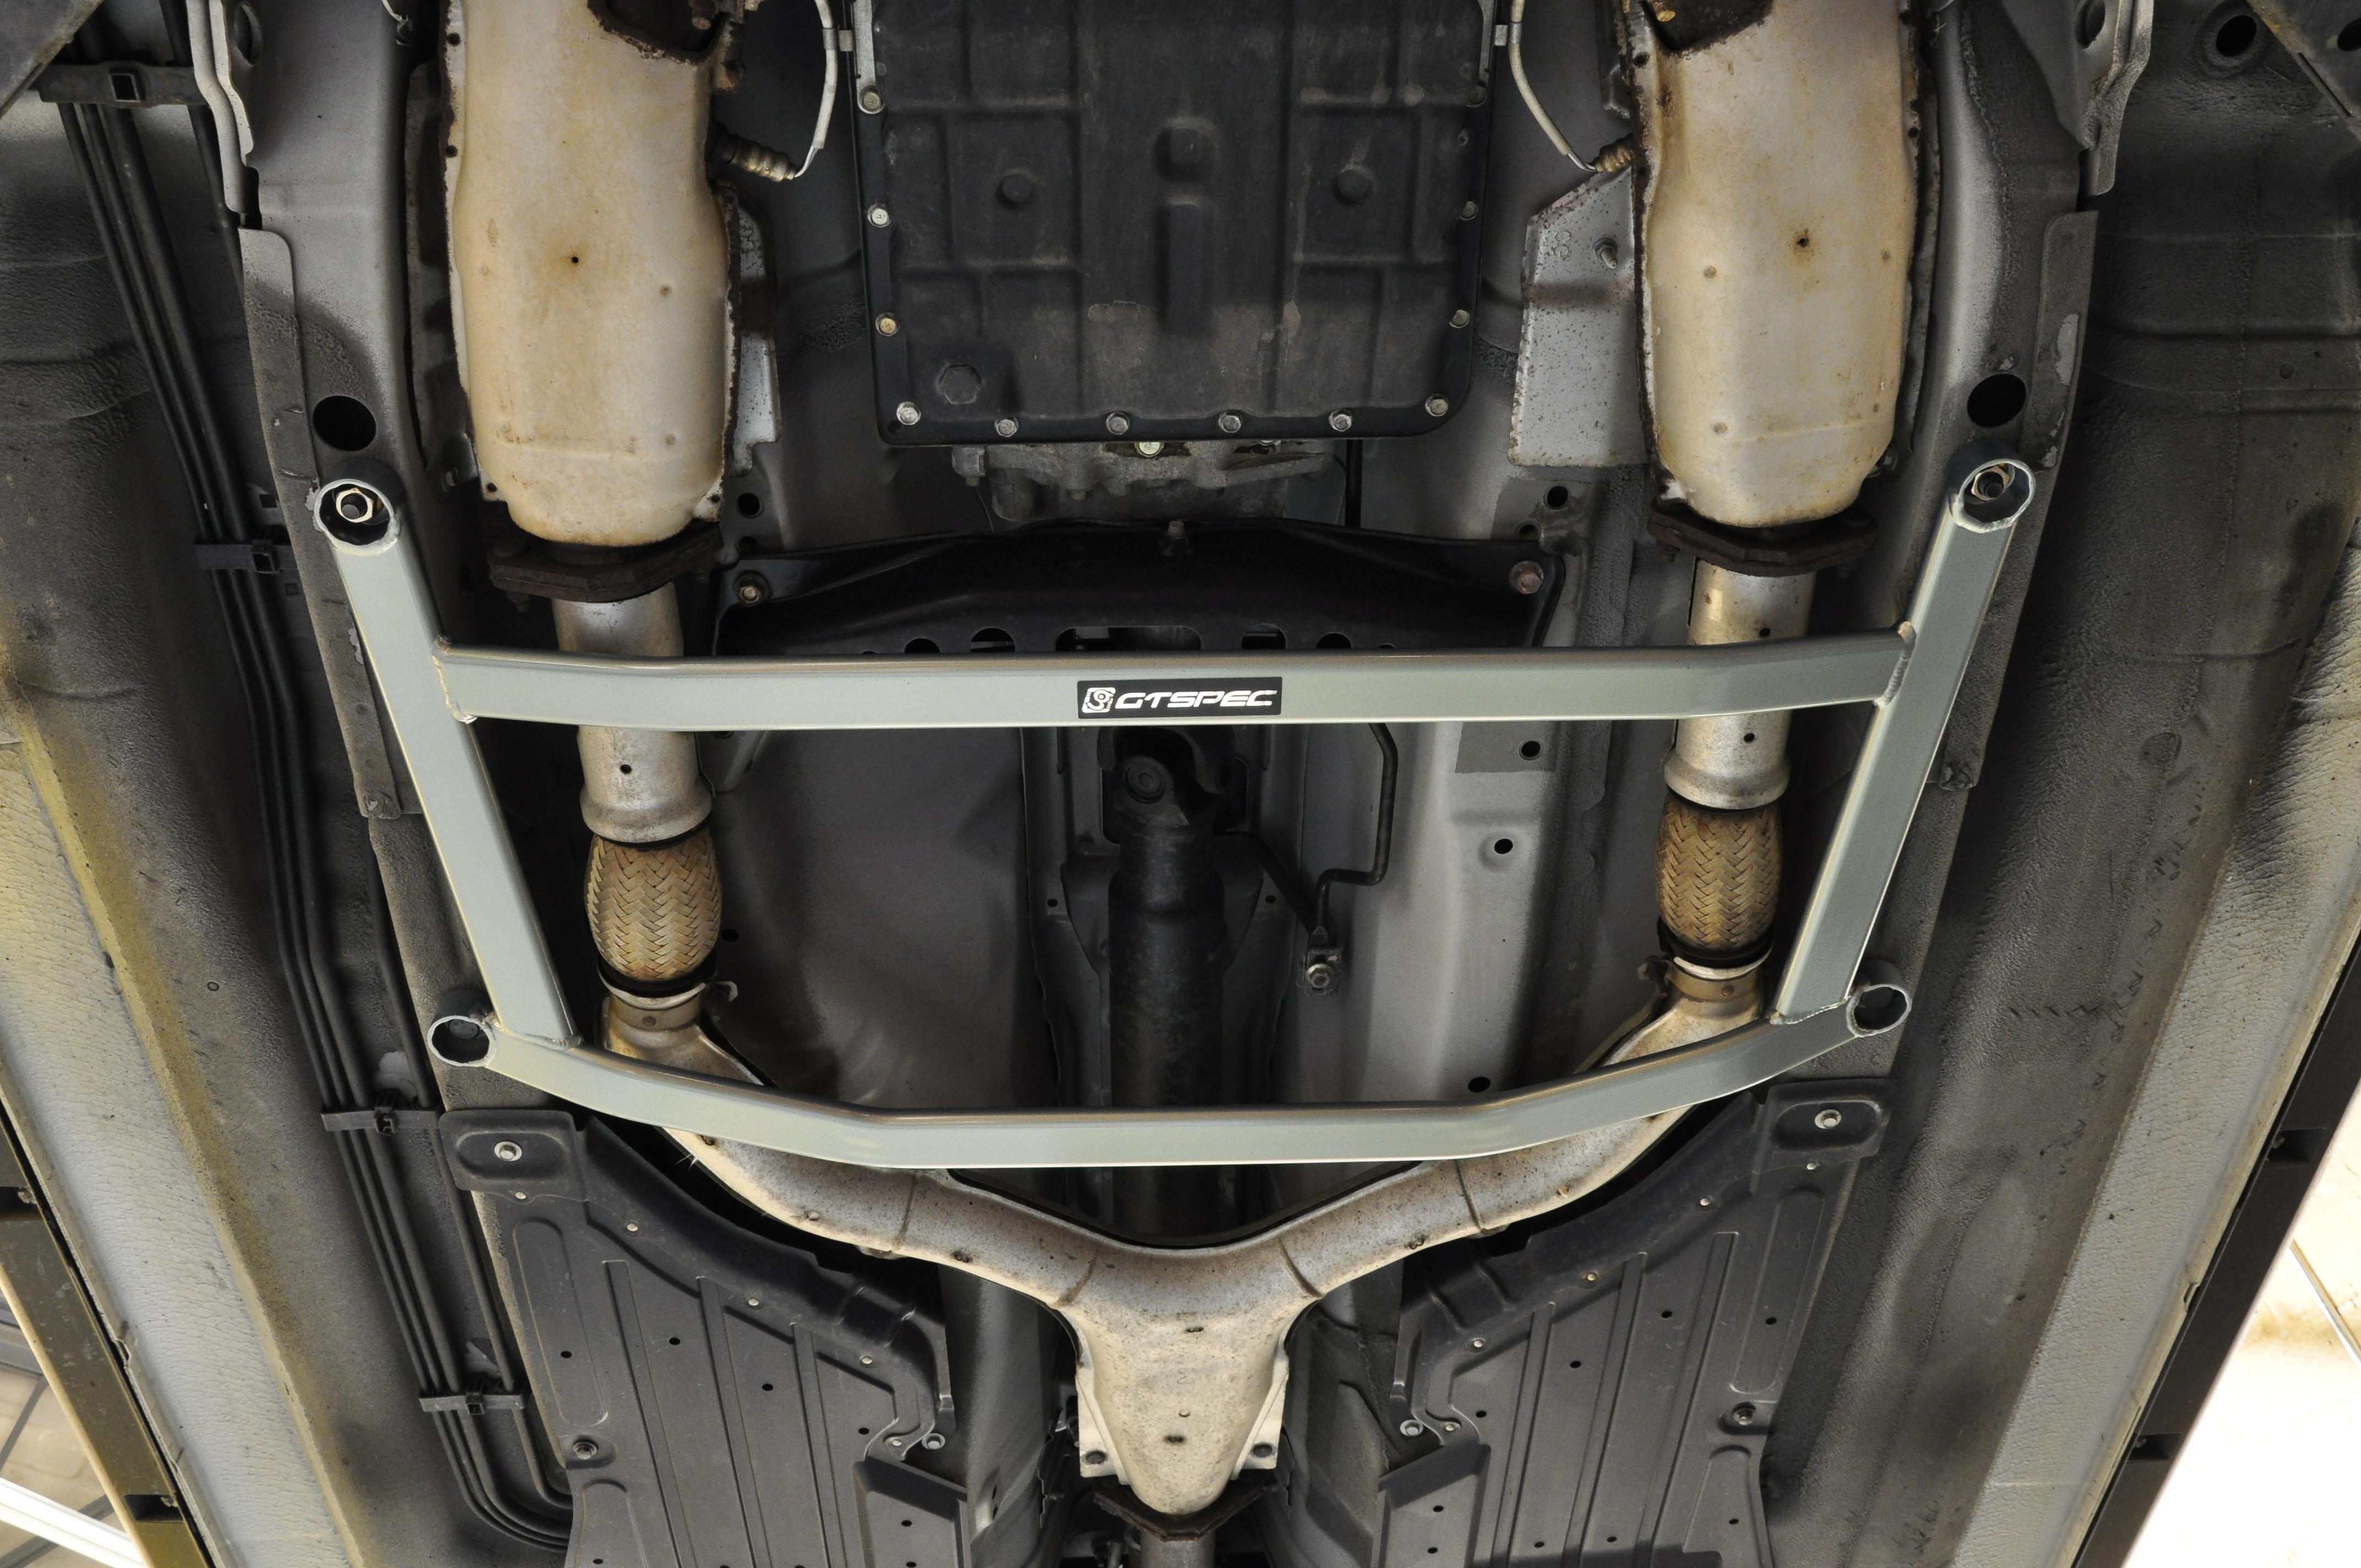 chassis brace fx35 infiniti reinforcement fx45 mid gtspec sus gts nissan